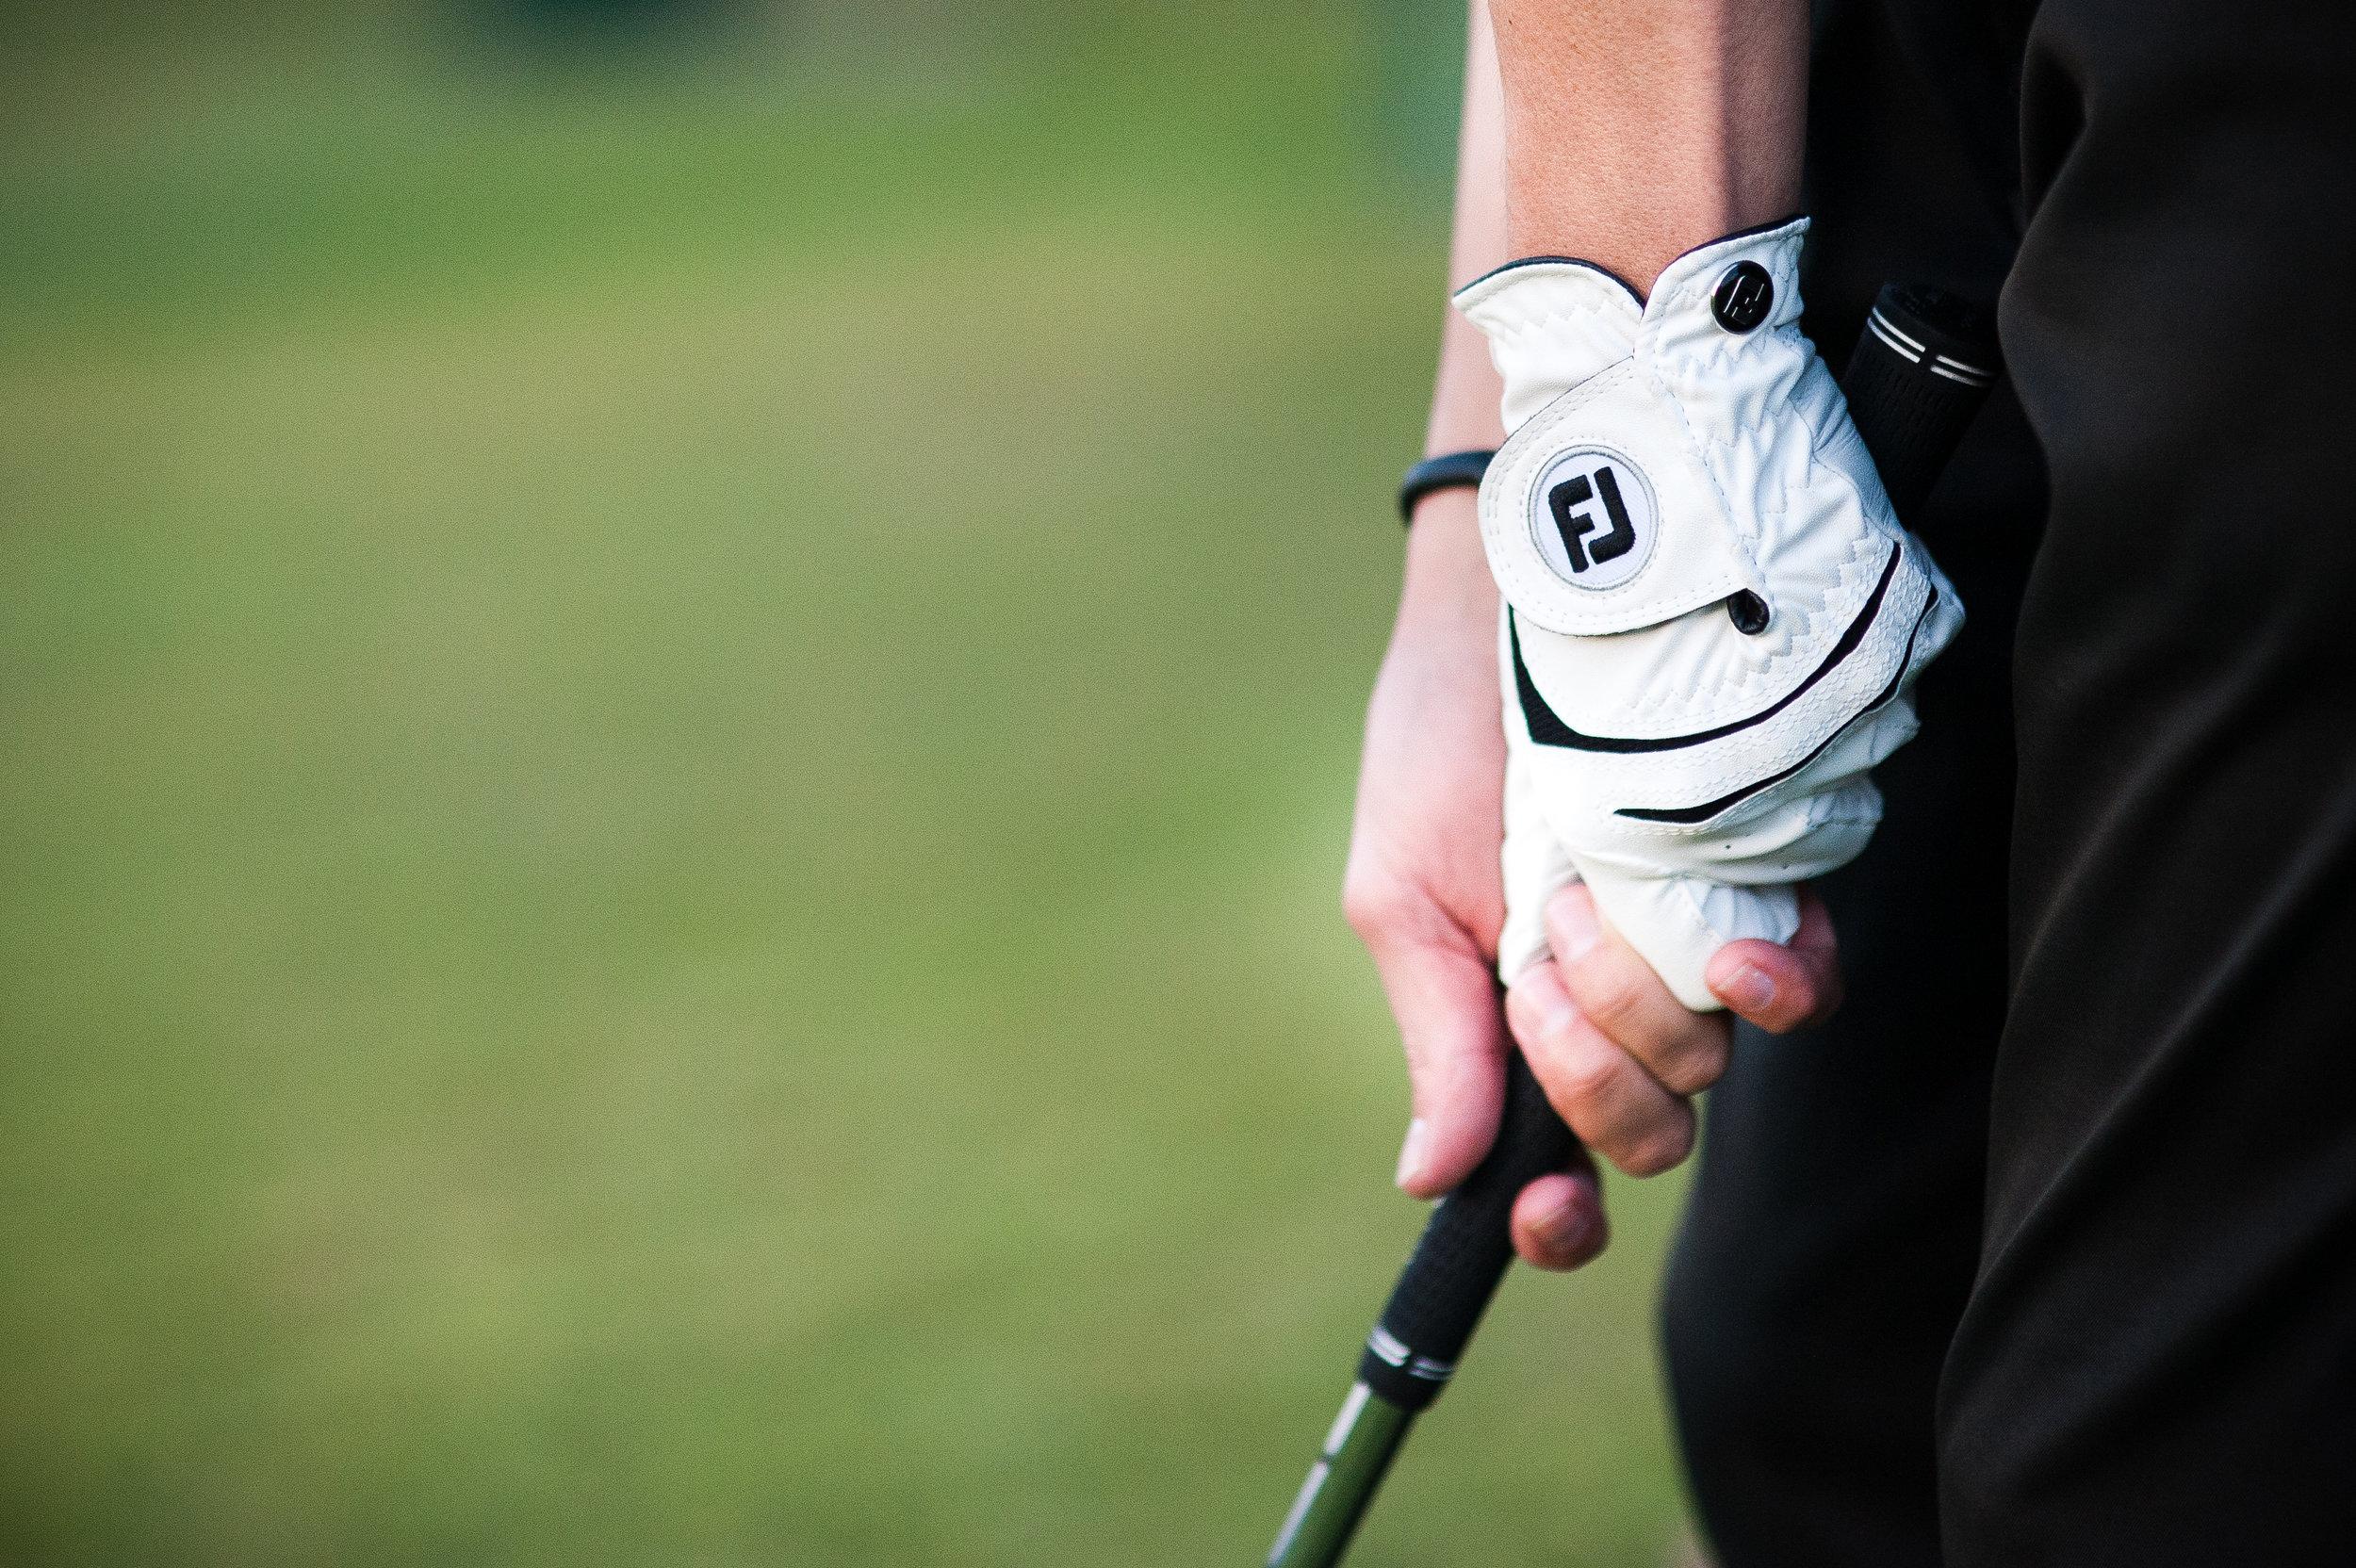 how to gripa golf club -